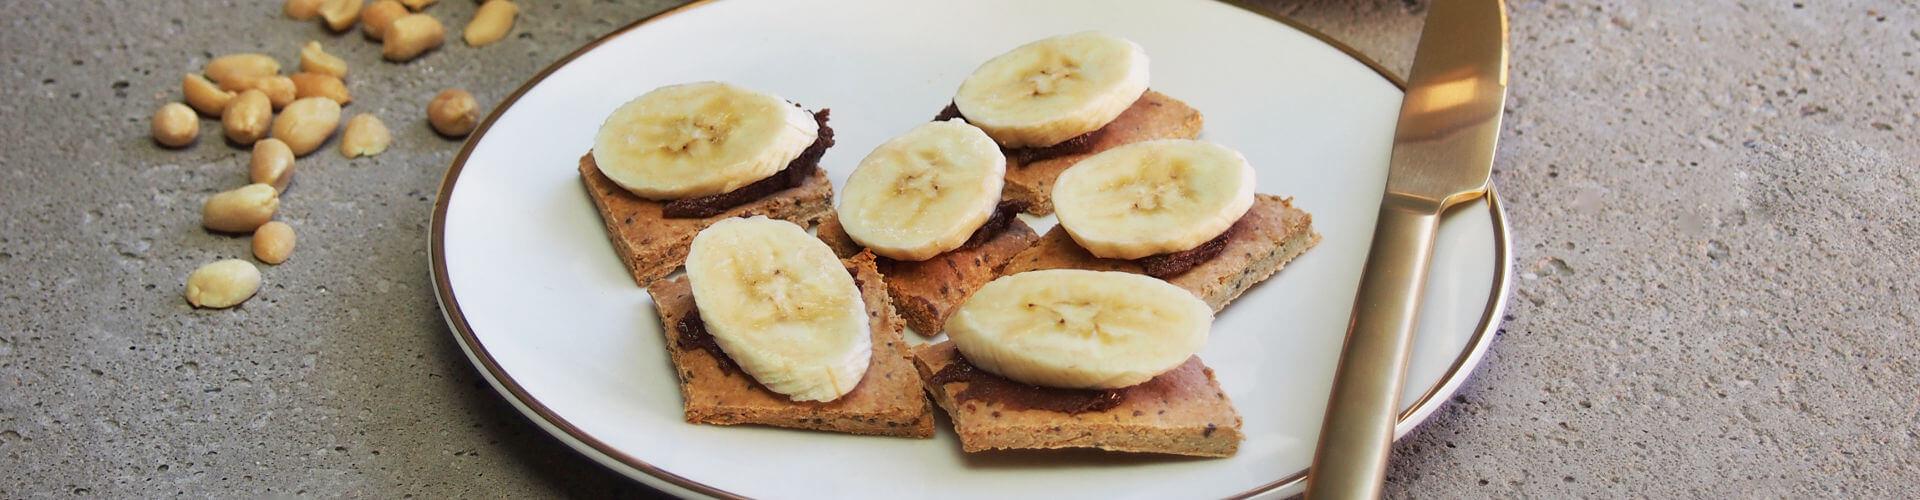 Mandel-Chia-Cracker